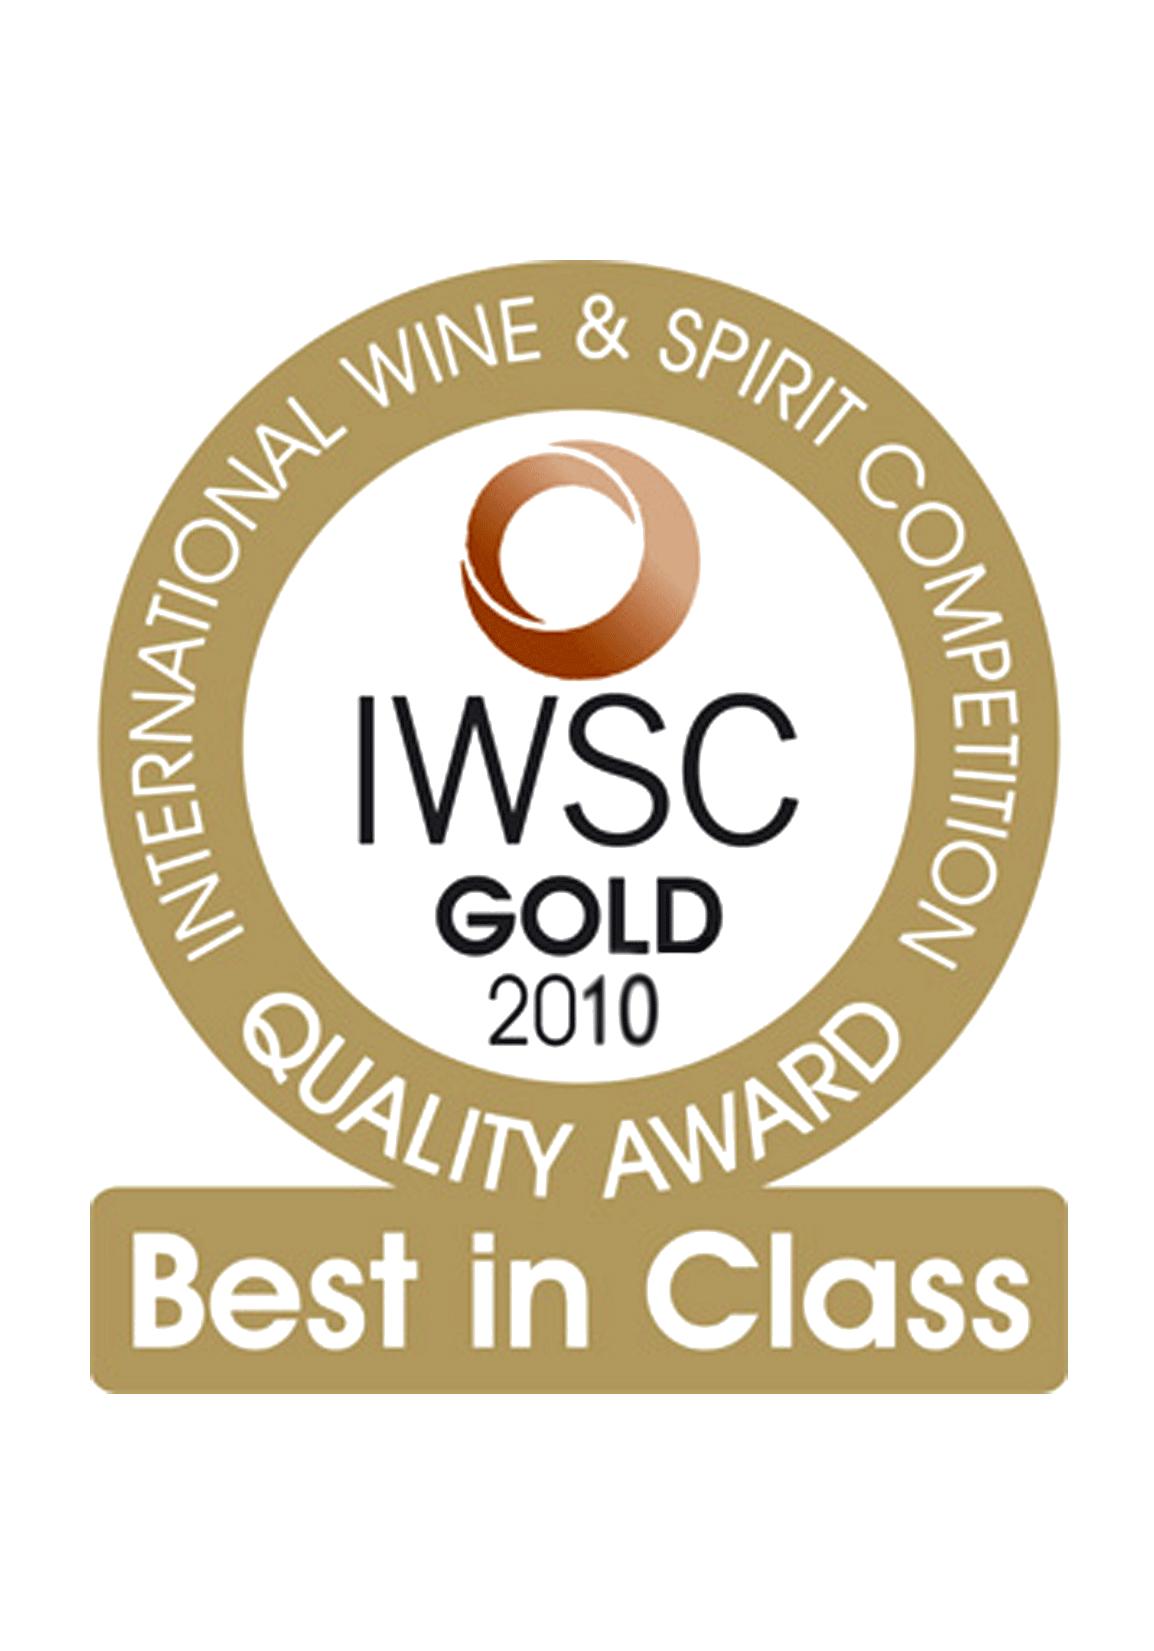 iwsc gold 2010